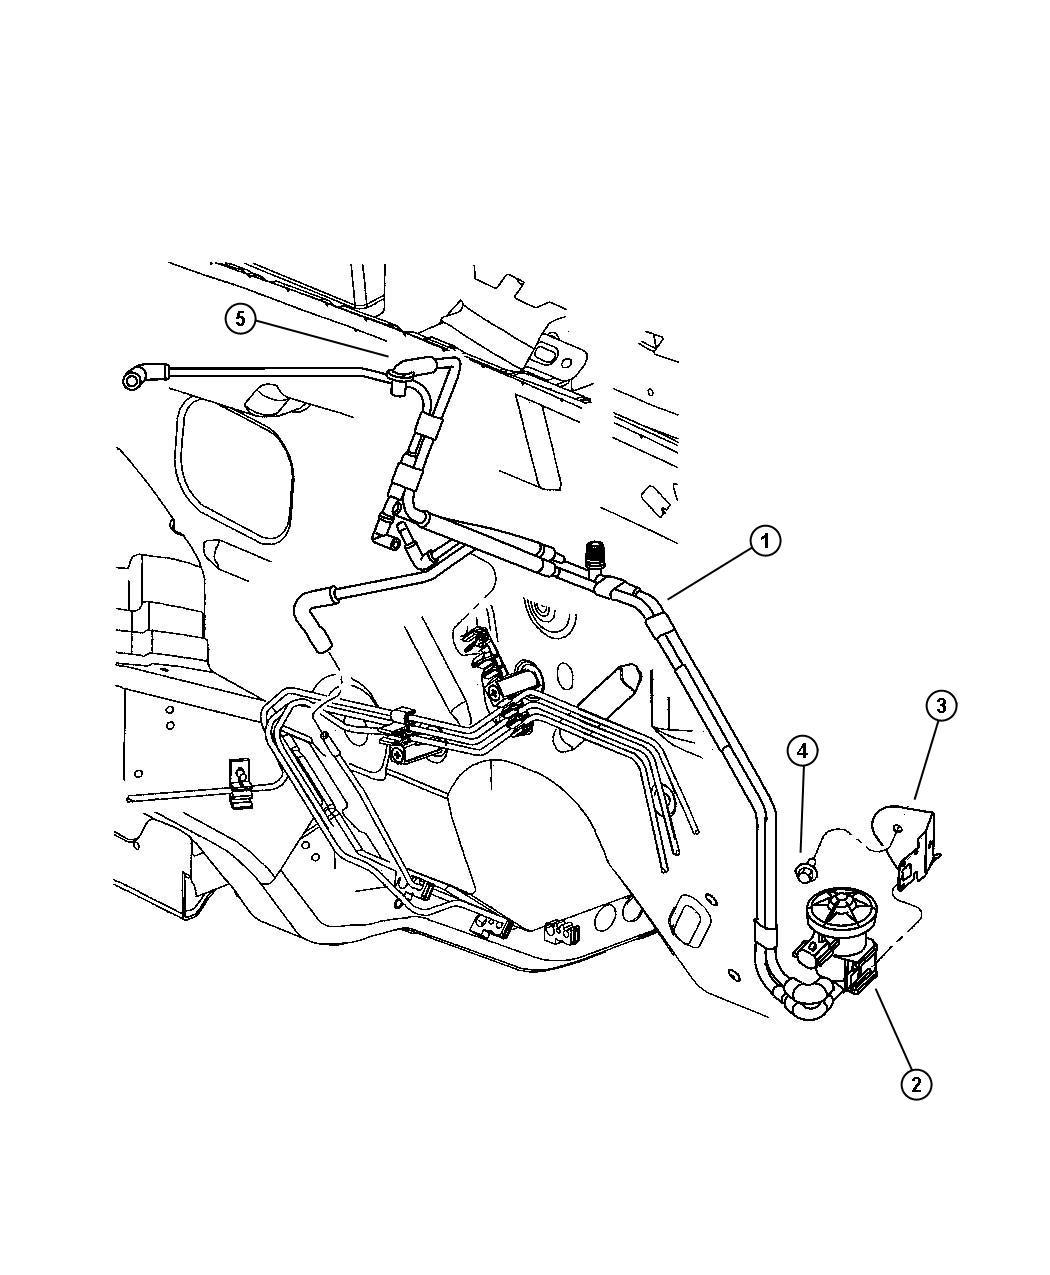 Chrysler Pt Cruiser Harness. Vacuum purge. Use 2/10/03 and